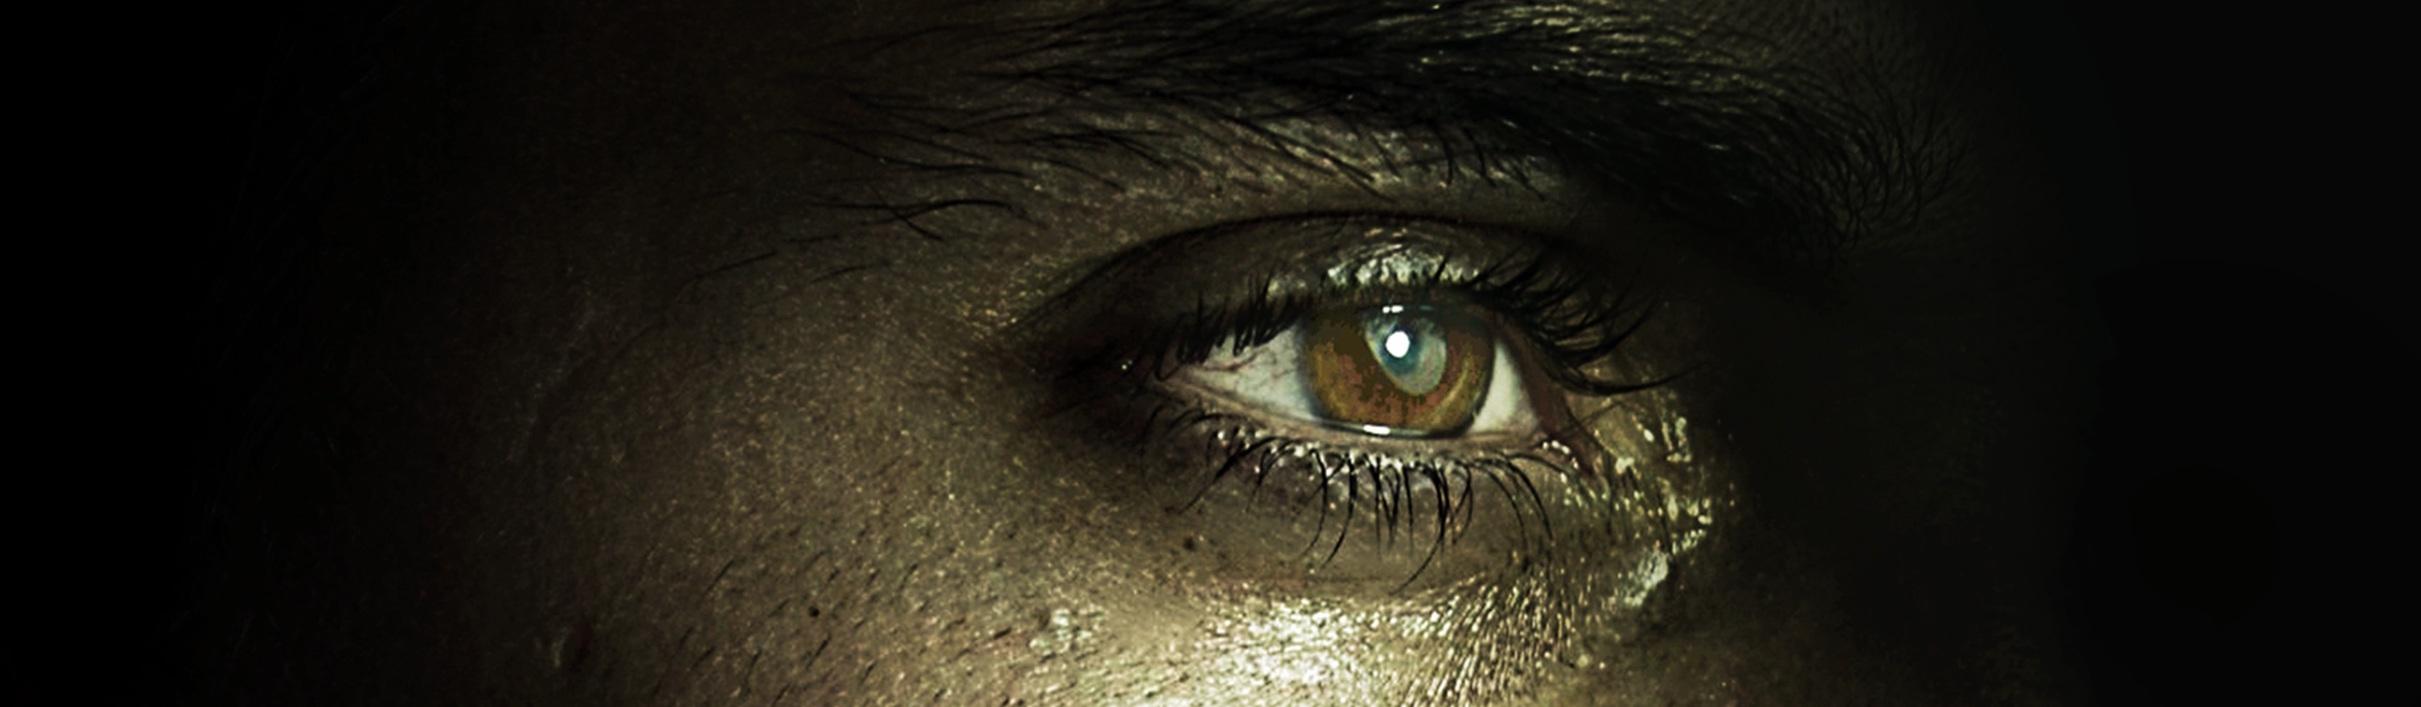 man-tears-tear-look-160848.jpeg